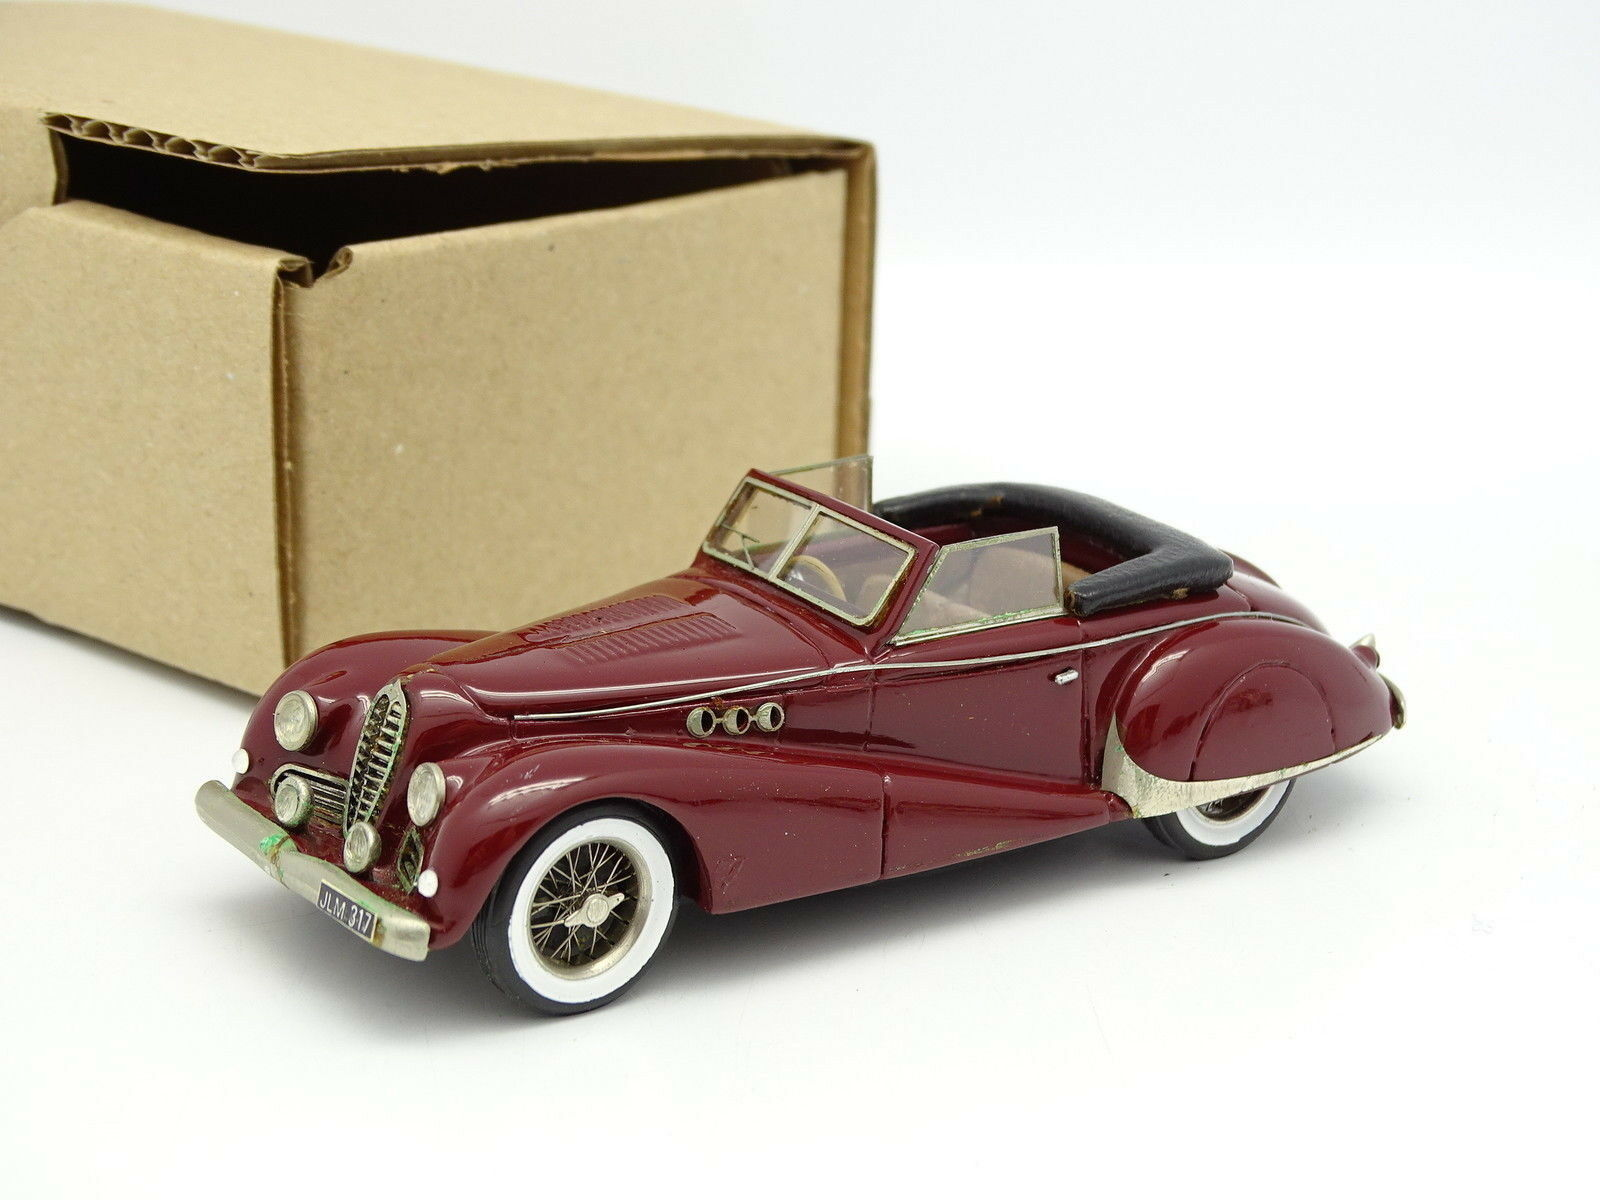 Ma Collection Brianza Resina 143  Delahaye 135 Ms Cabrio Antem 1947 Rosso